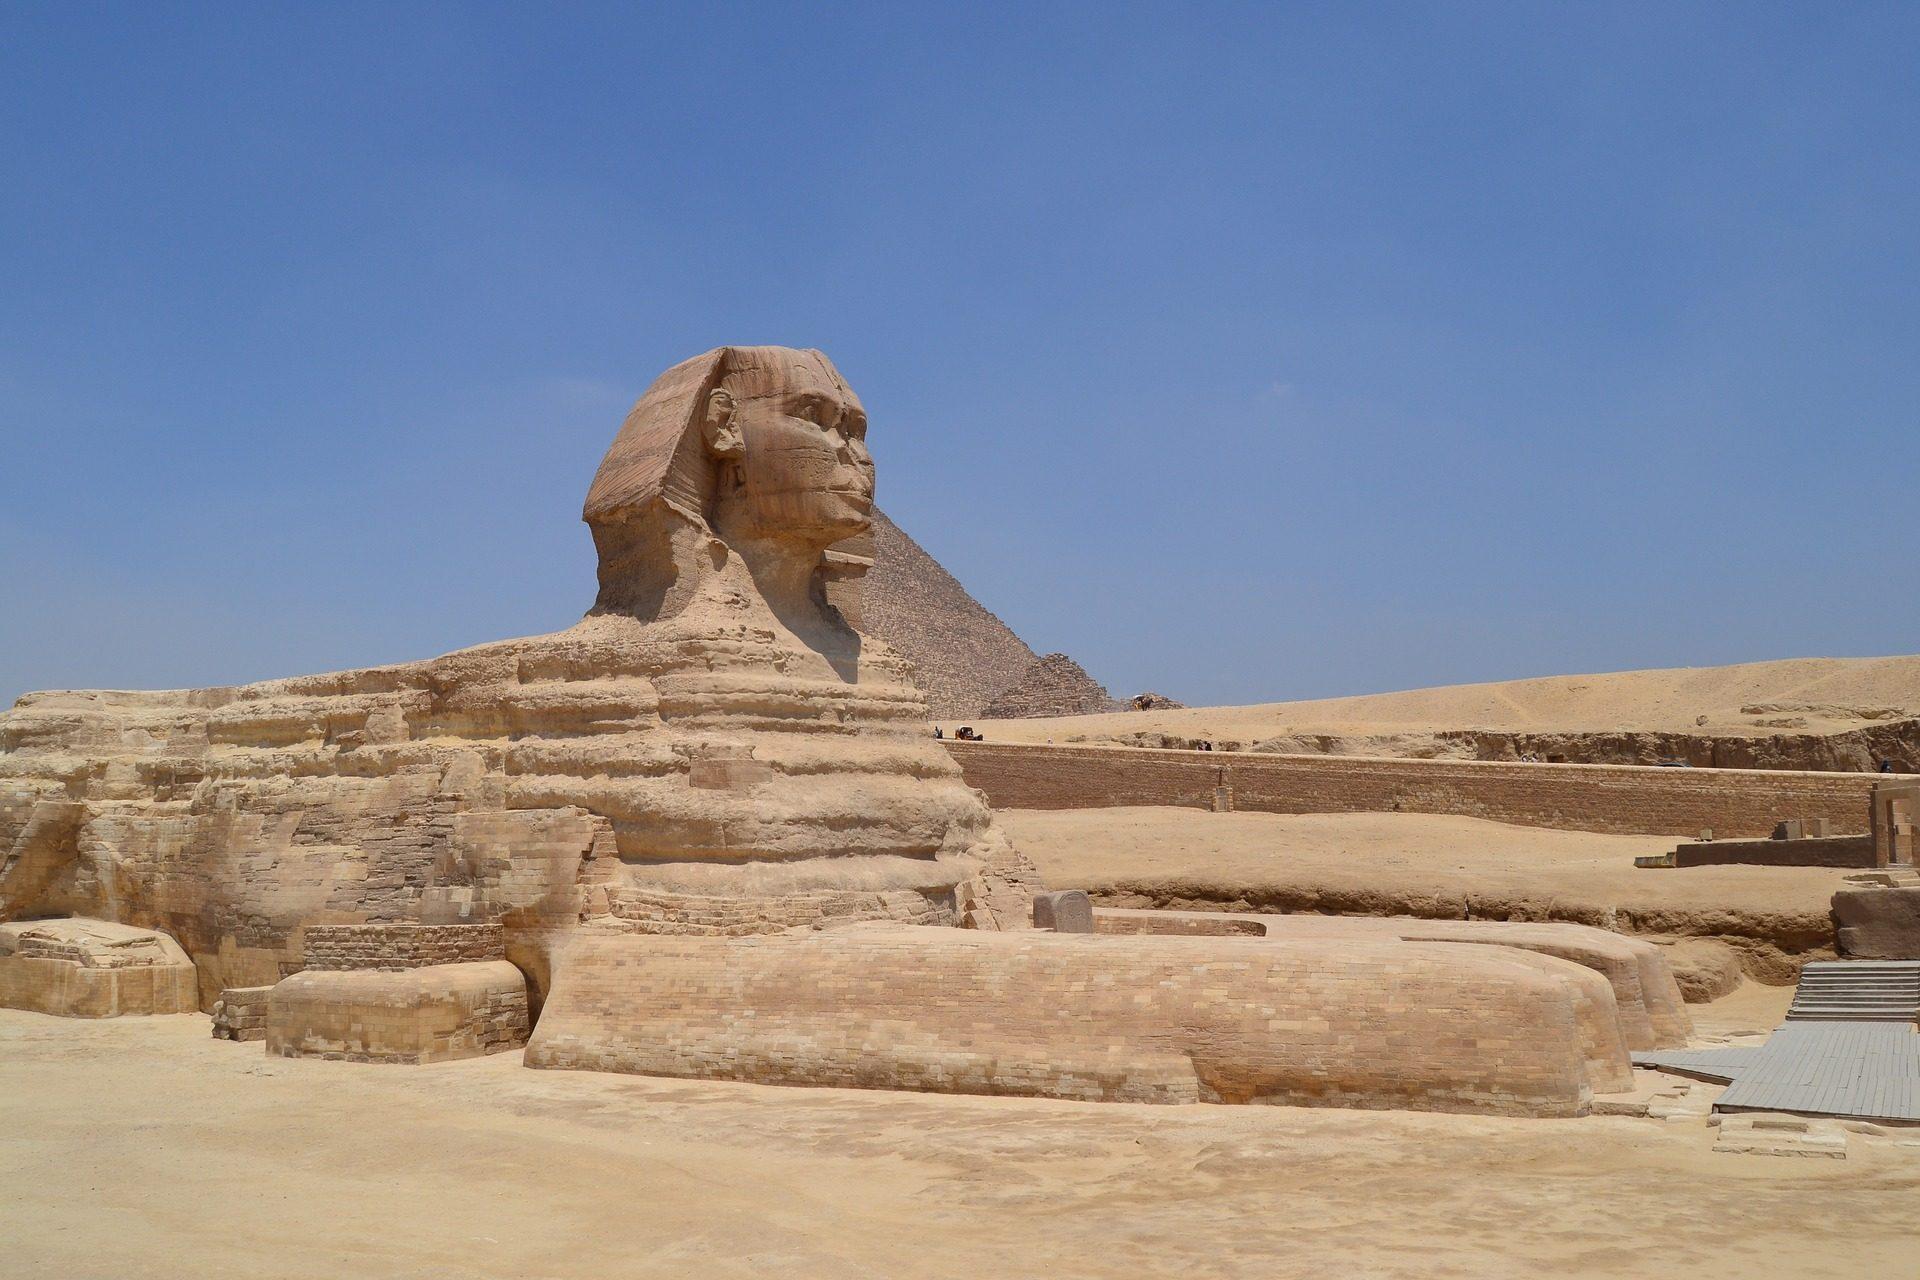 Sphinx, Statue, Denkmal, Architektur, Wüste, Kairo, Ägypten - Wallpaper HD - Prof.-falken.com